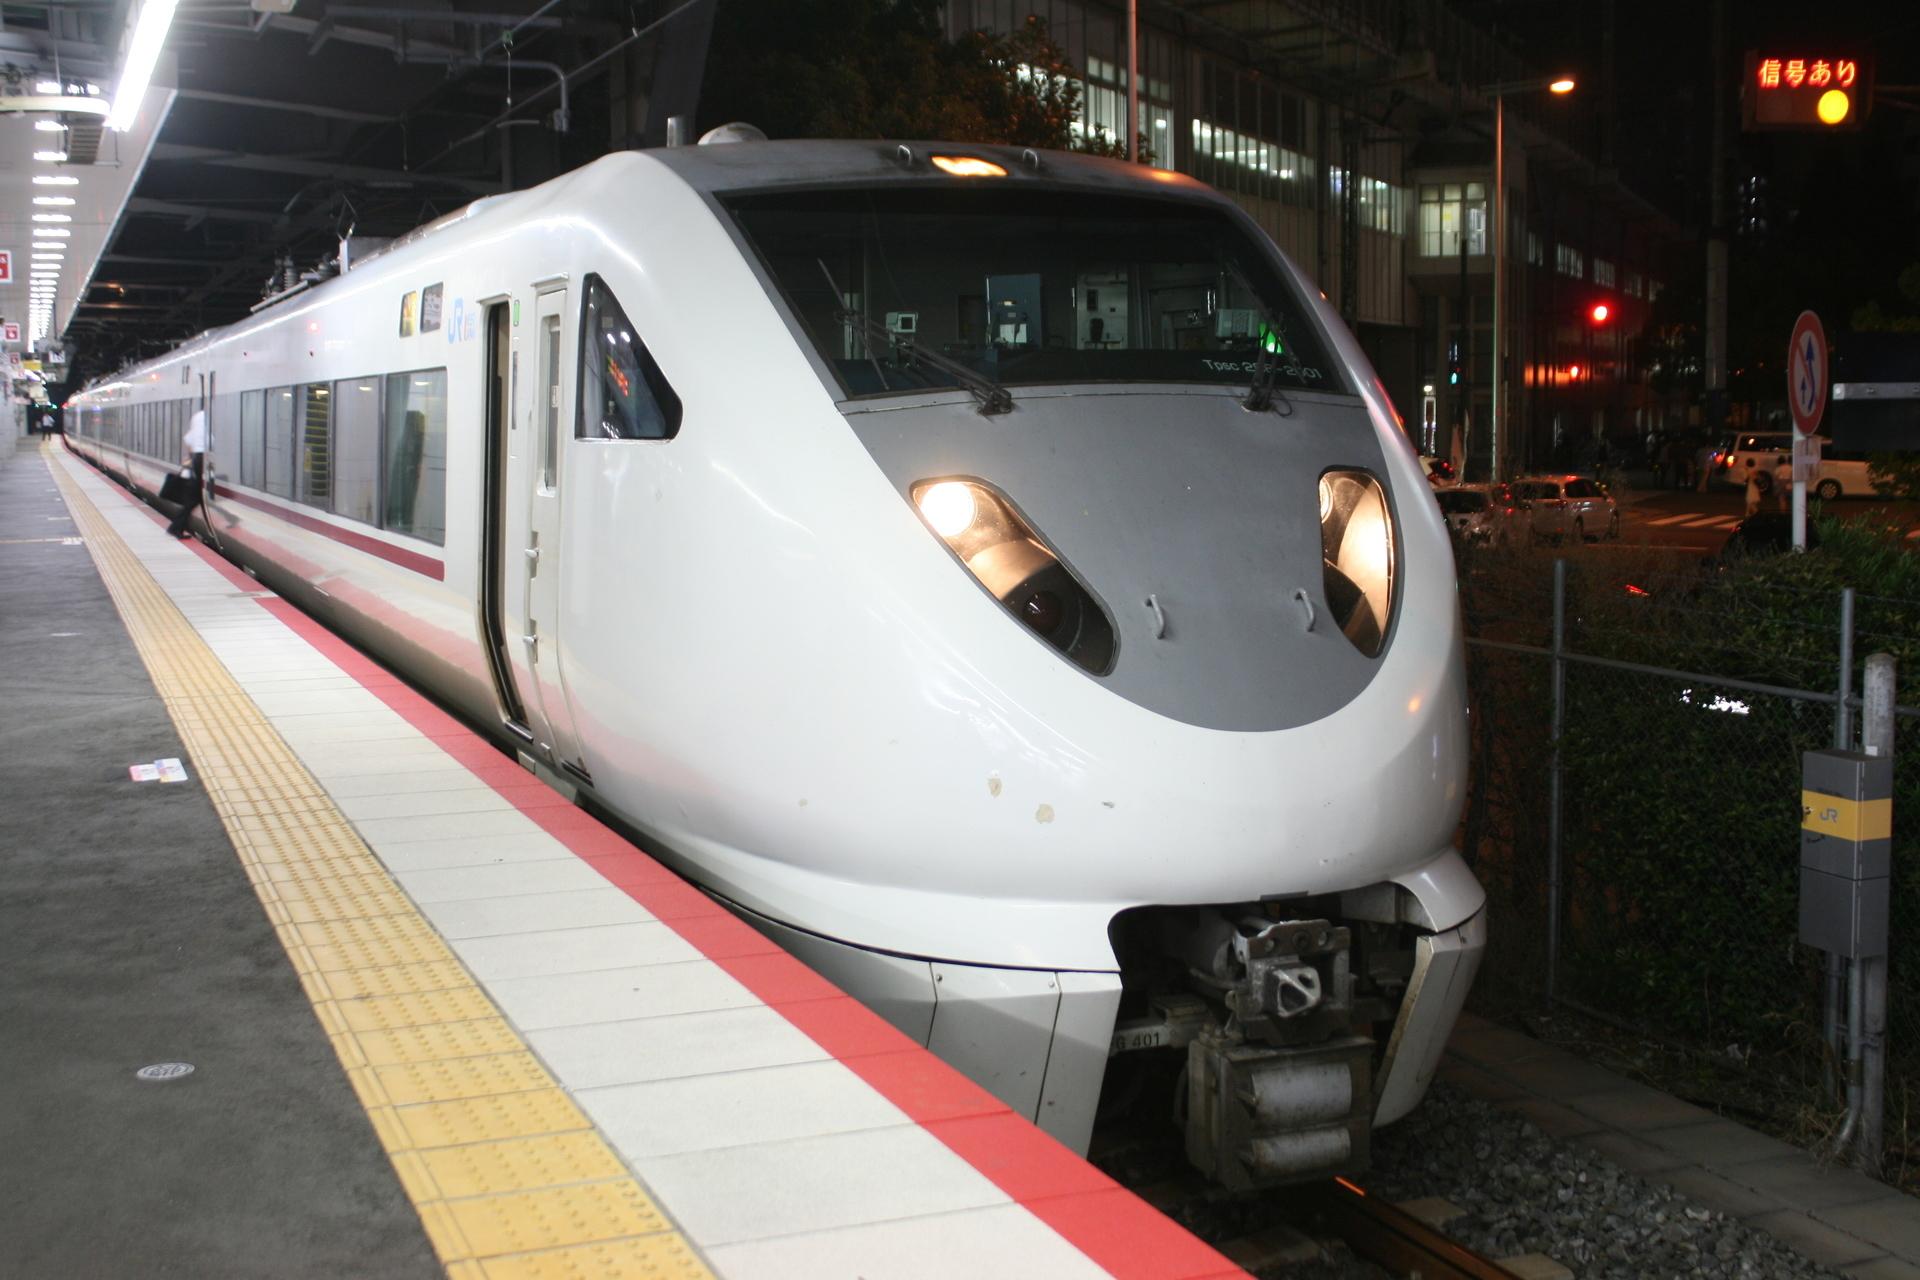 IMG_8745金沢〜和倉温泉間を結ぶ特急「能登かがり火」.JPG